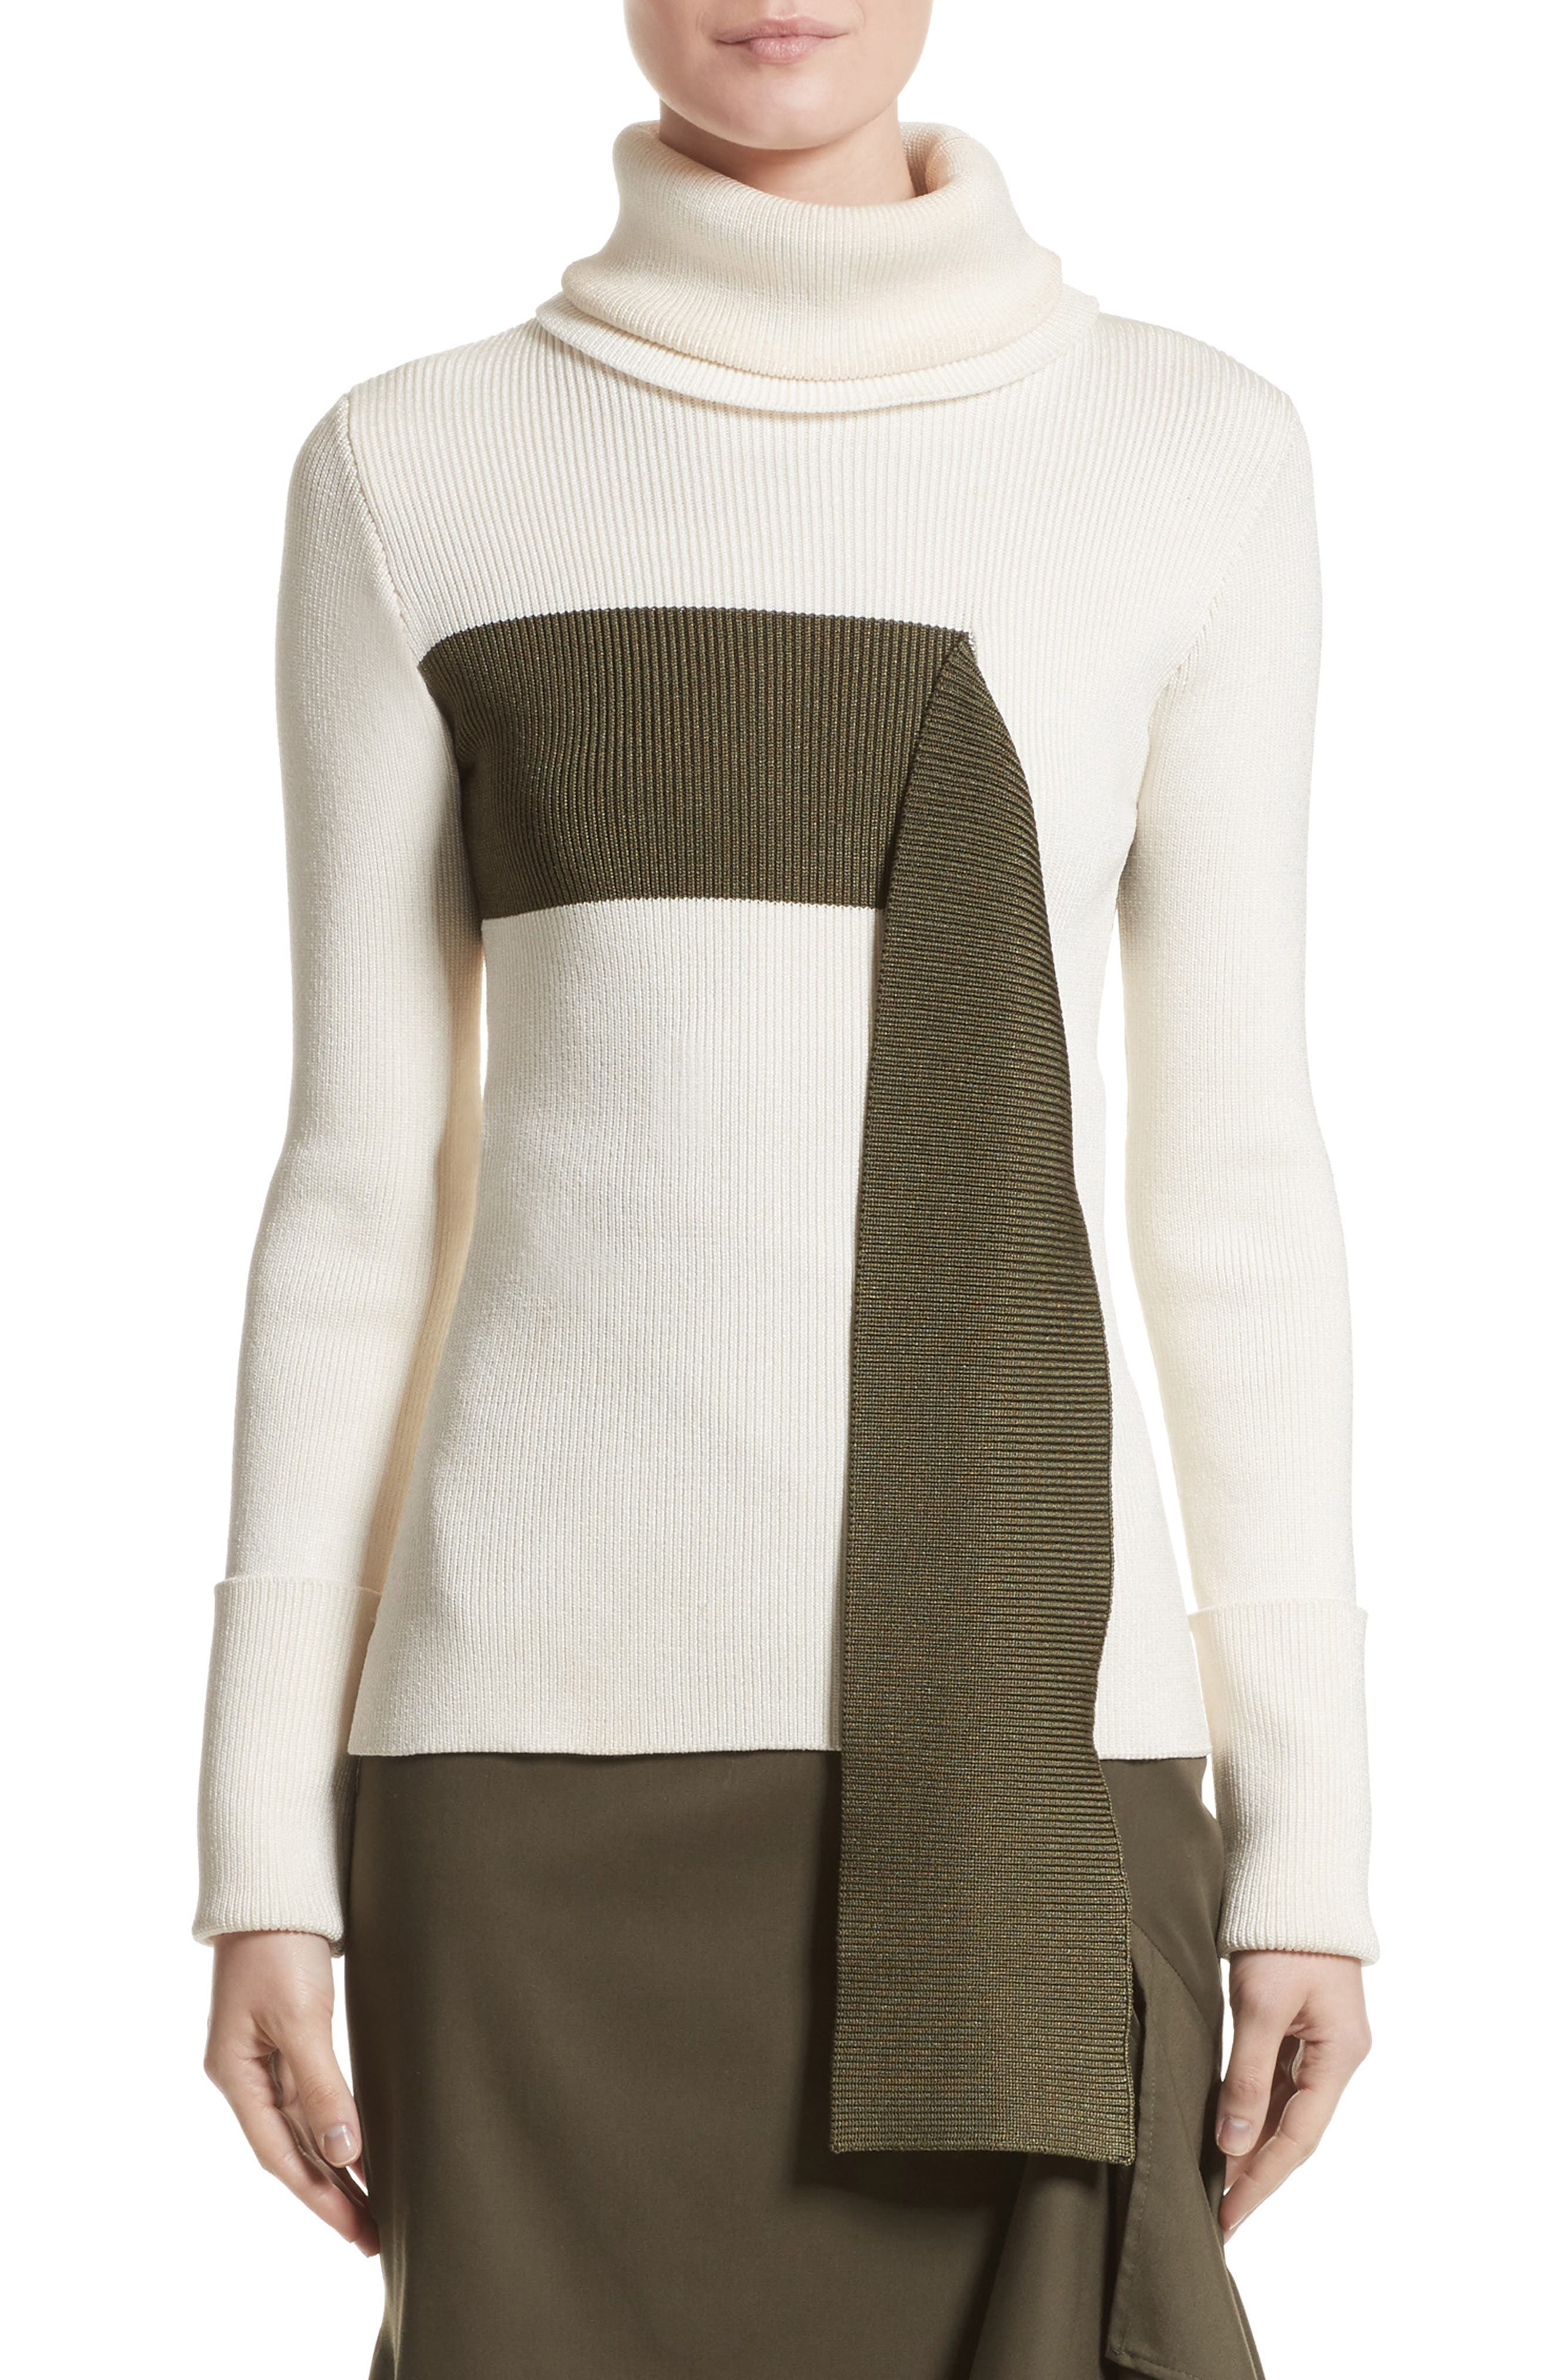 Monse Falling Stripe Turtleneck Sweater